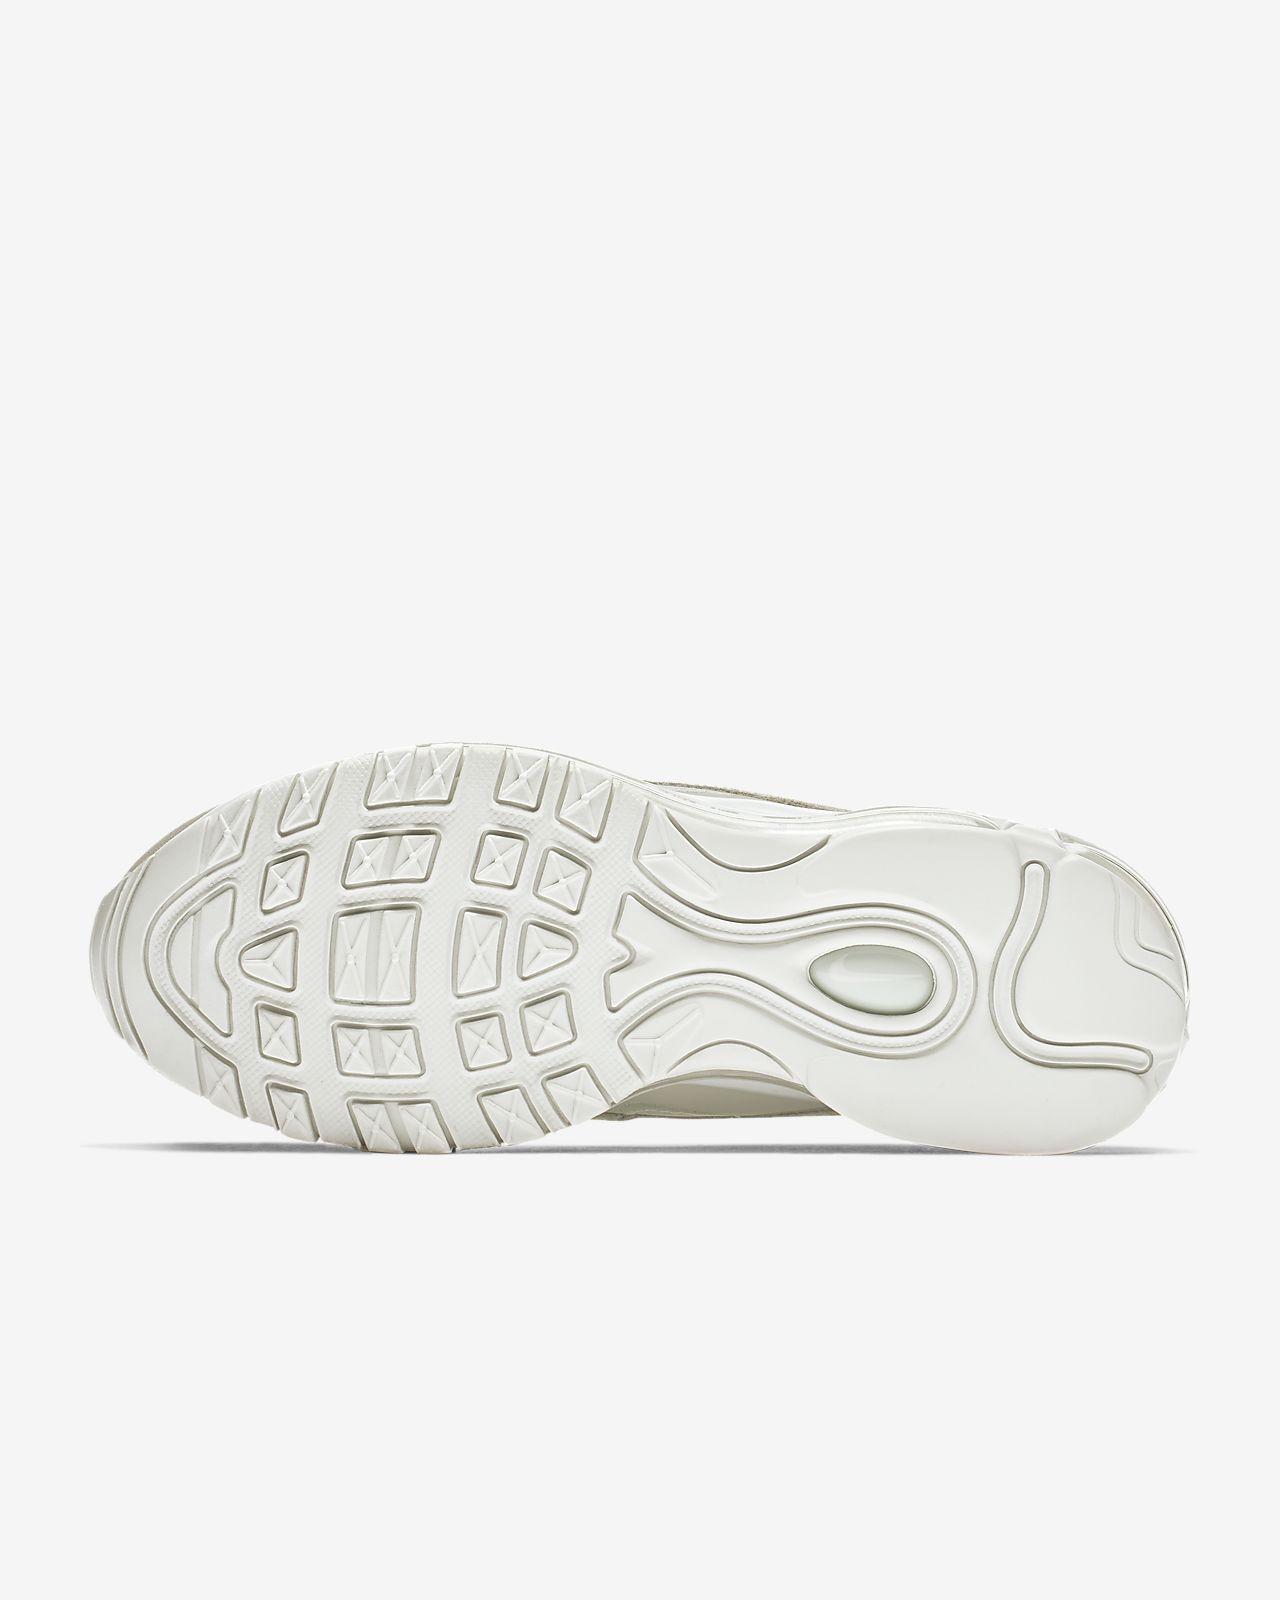 2d2fad8aefe Nike Air Max 97 Premium Women s Shoe. Nike.com GB